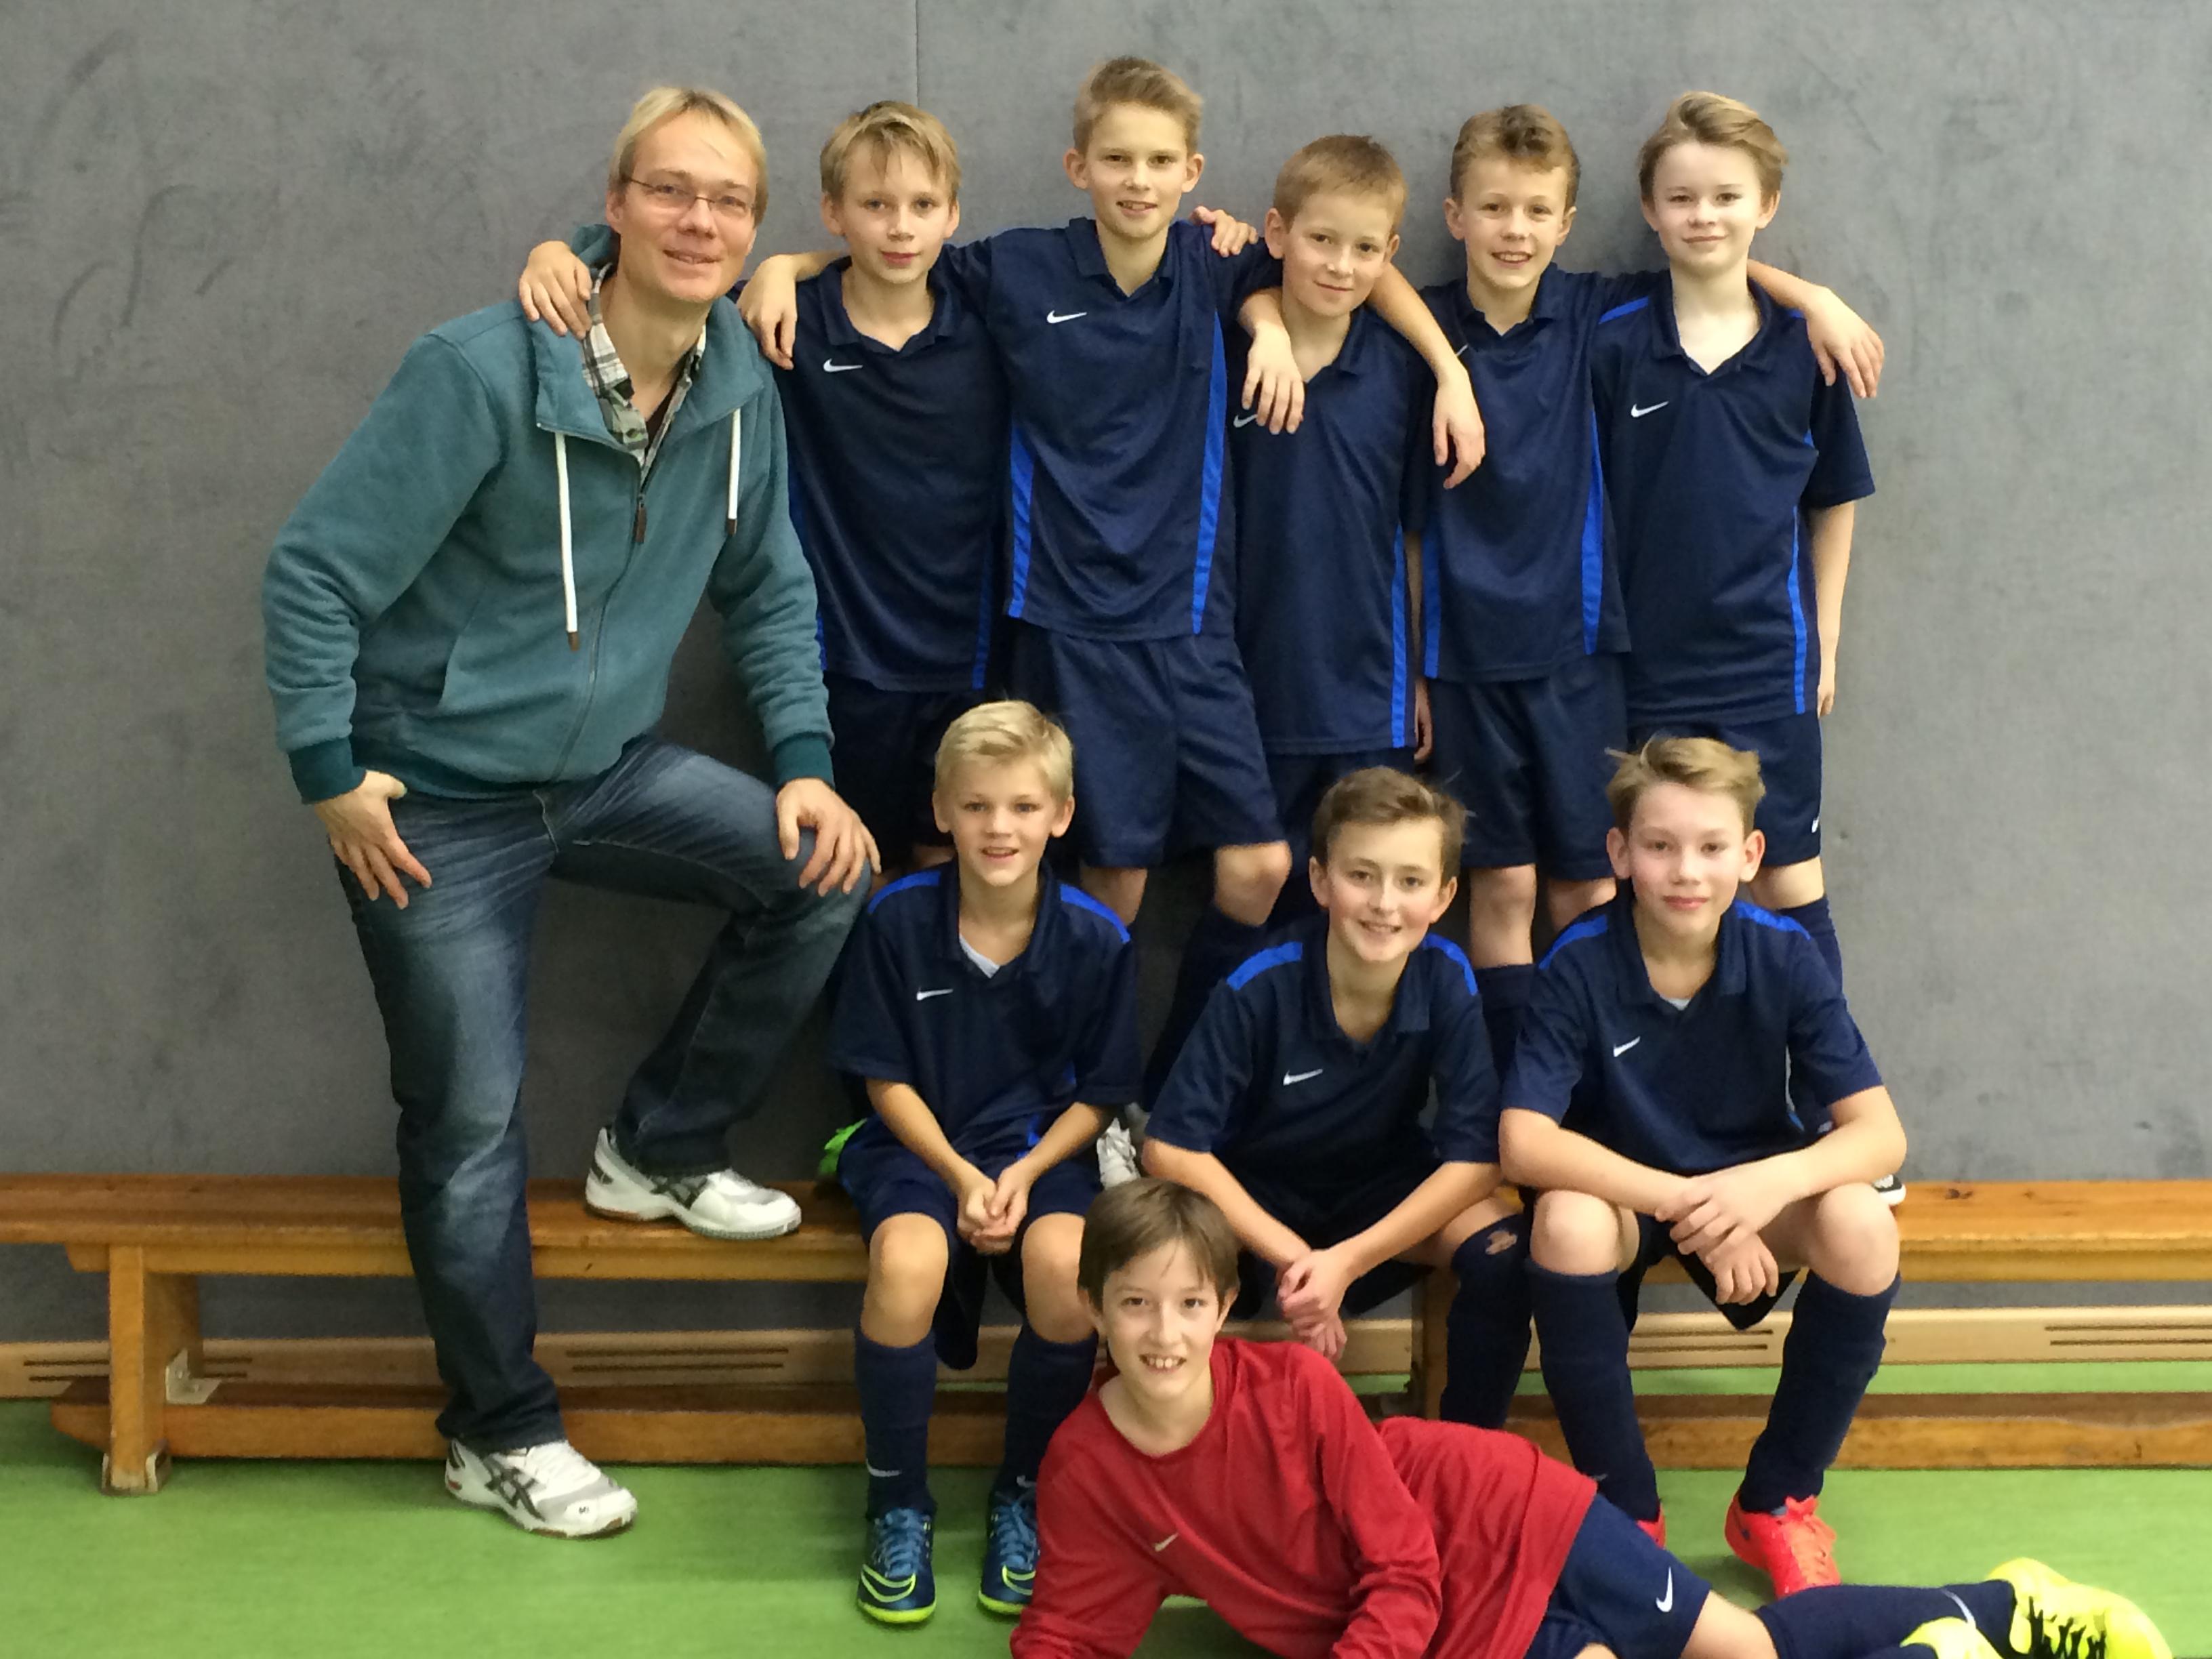 Jungen Klasse 5 2. Runde Uwe-Seeler-Pokal 14.1.2016